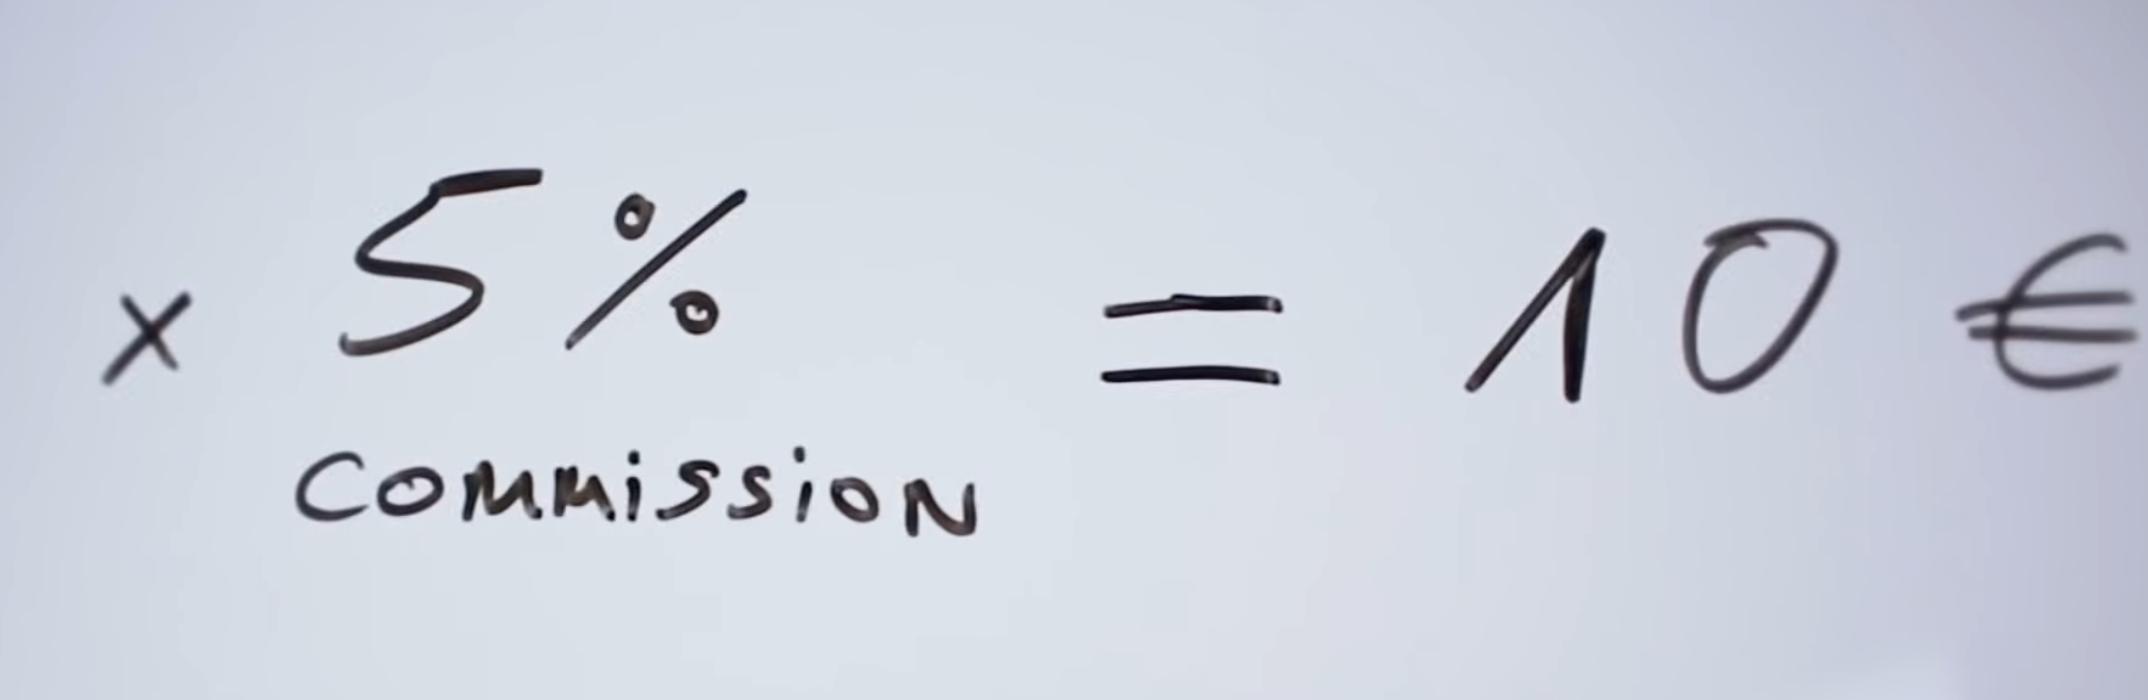 affiliation 5 commissions